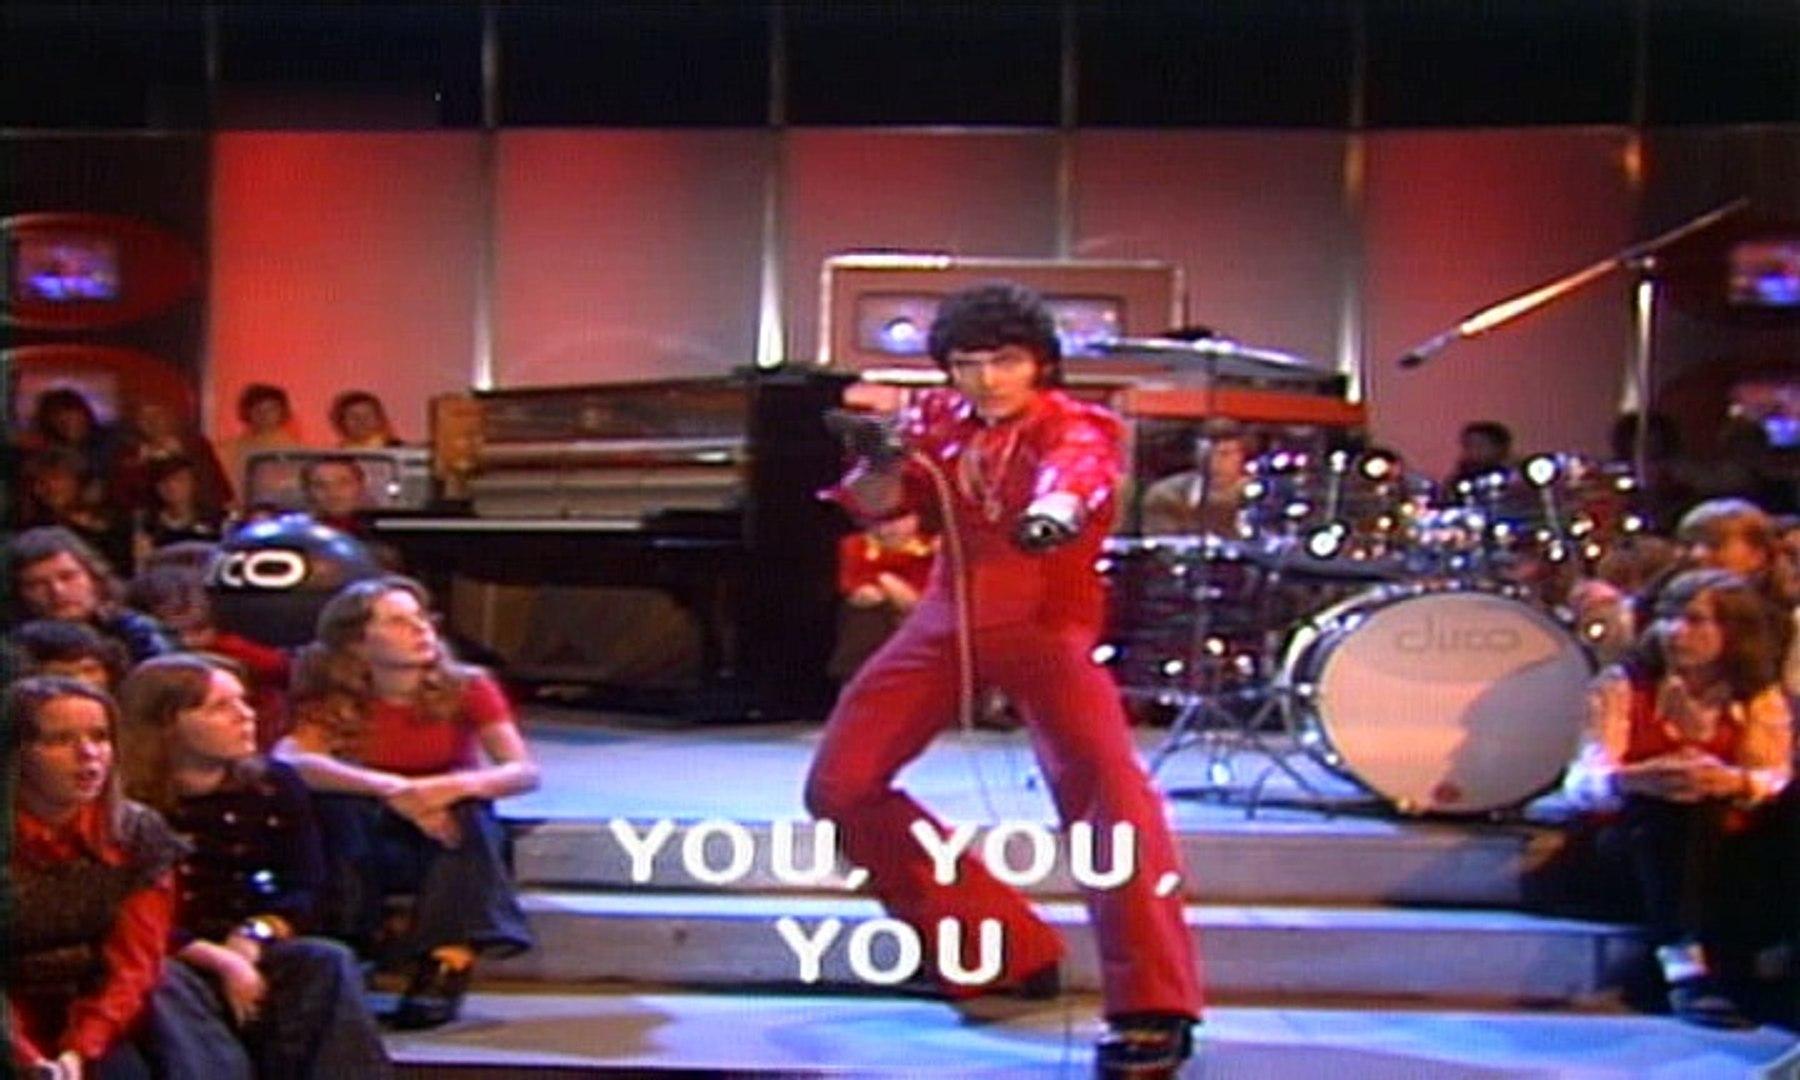 You You You 1974